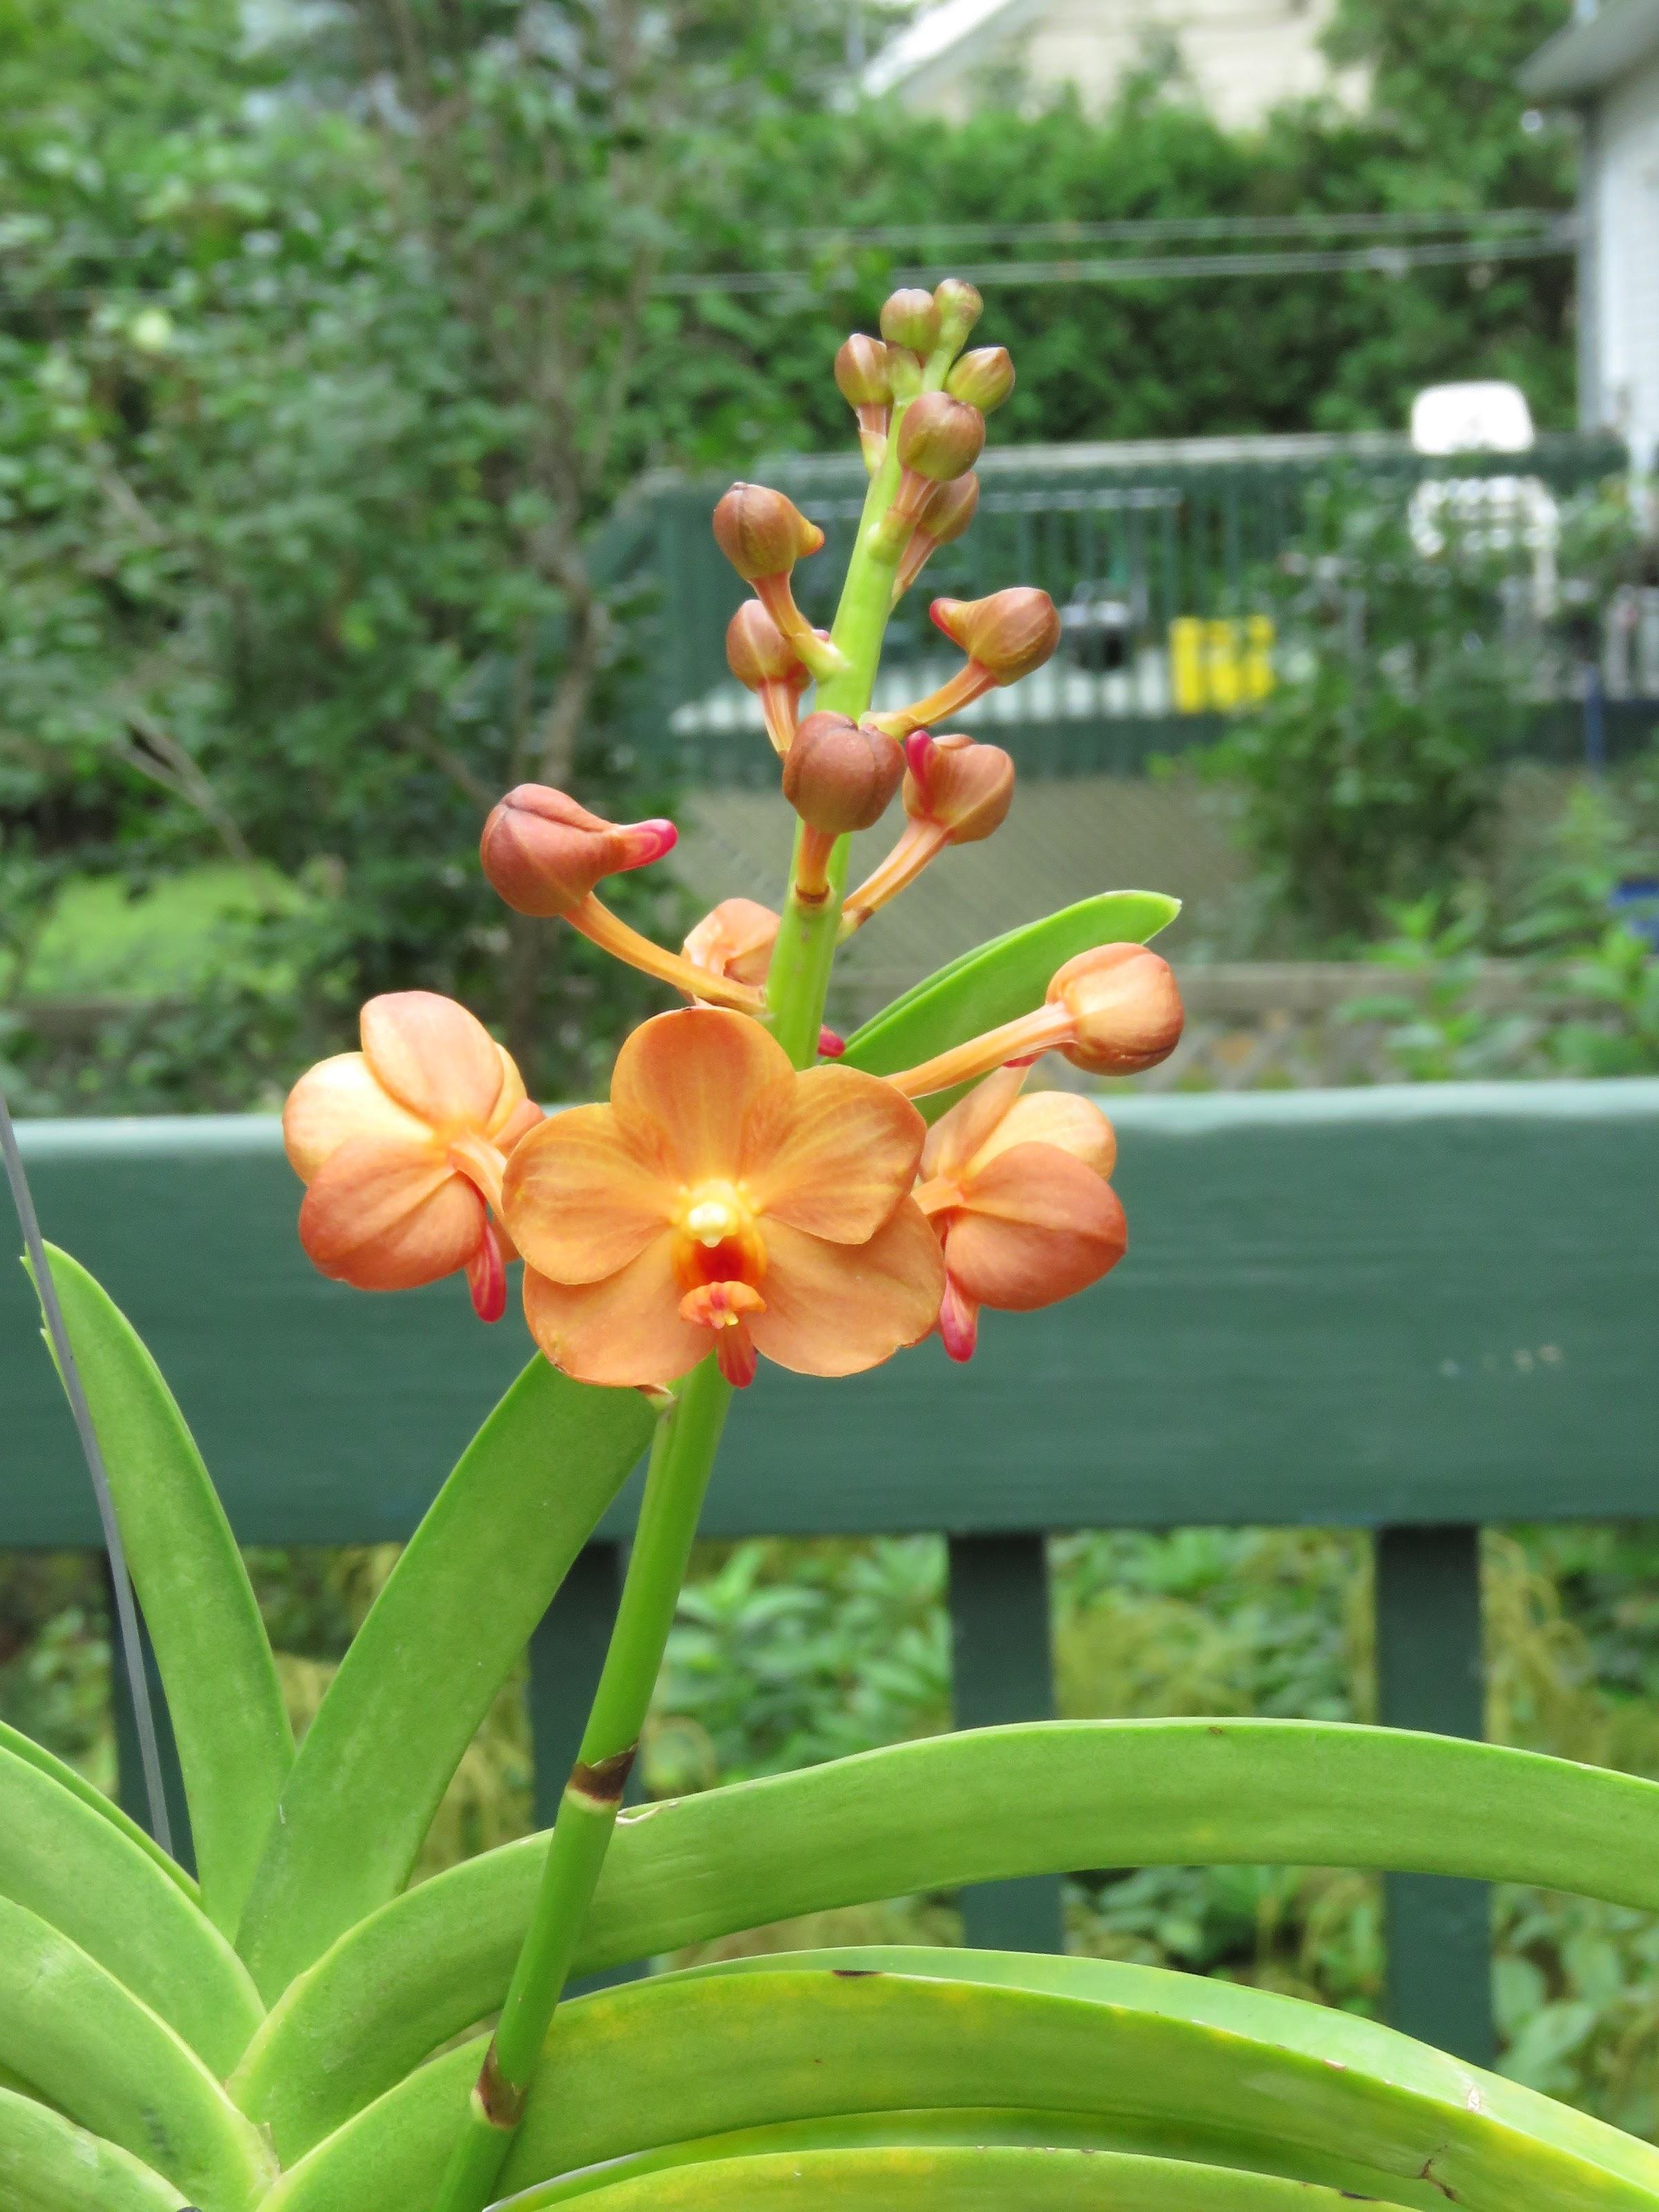 Les orchidées de Grigri - Page 8 Xb7LVlsp7Sf1Ns0dFEfTEk7uioxA66_ULpXuw21y8LDX-nWc5X0zoi0nl9aLkTMspYDmLHEyMDYNR-V0eyKV4VEG5y4ZFThos0j9N4GoLAOIQHBVkyUJ99wXIEG34PM98sKMkQTYW0A=w2400